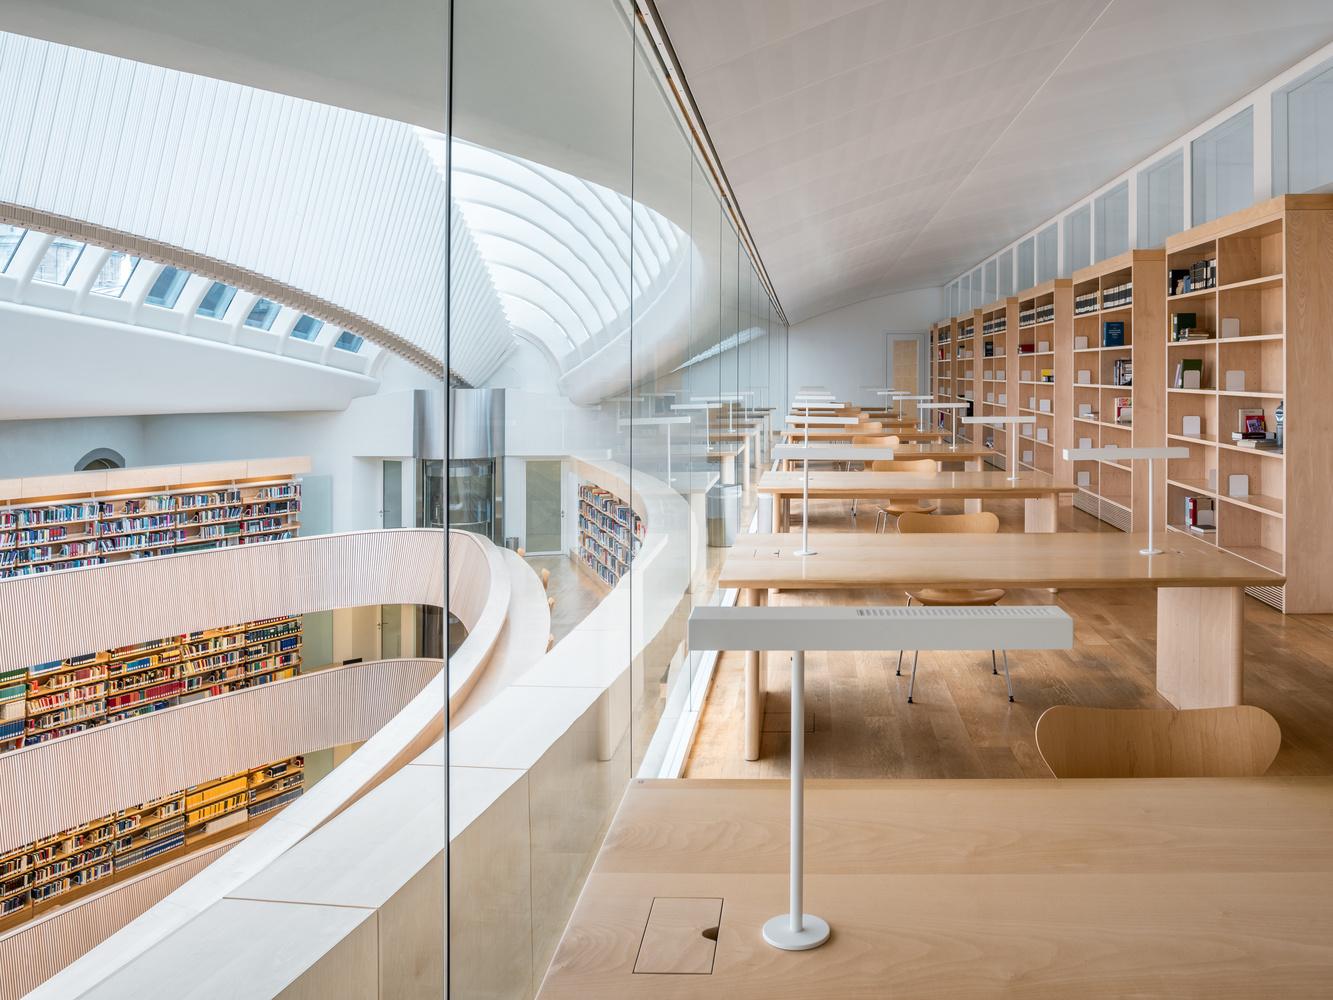 Law library University Zurich   Study by Sebastian Grundgeir